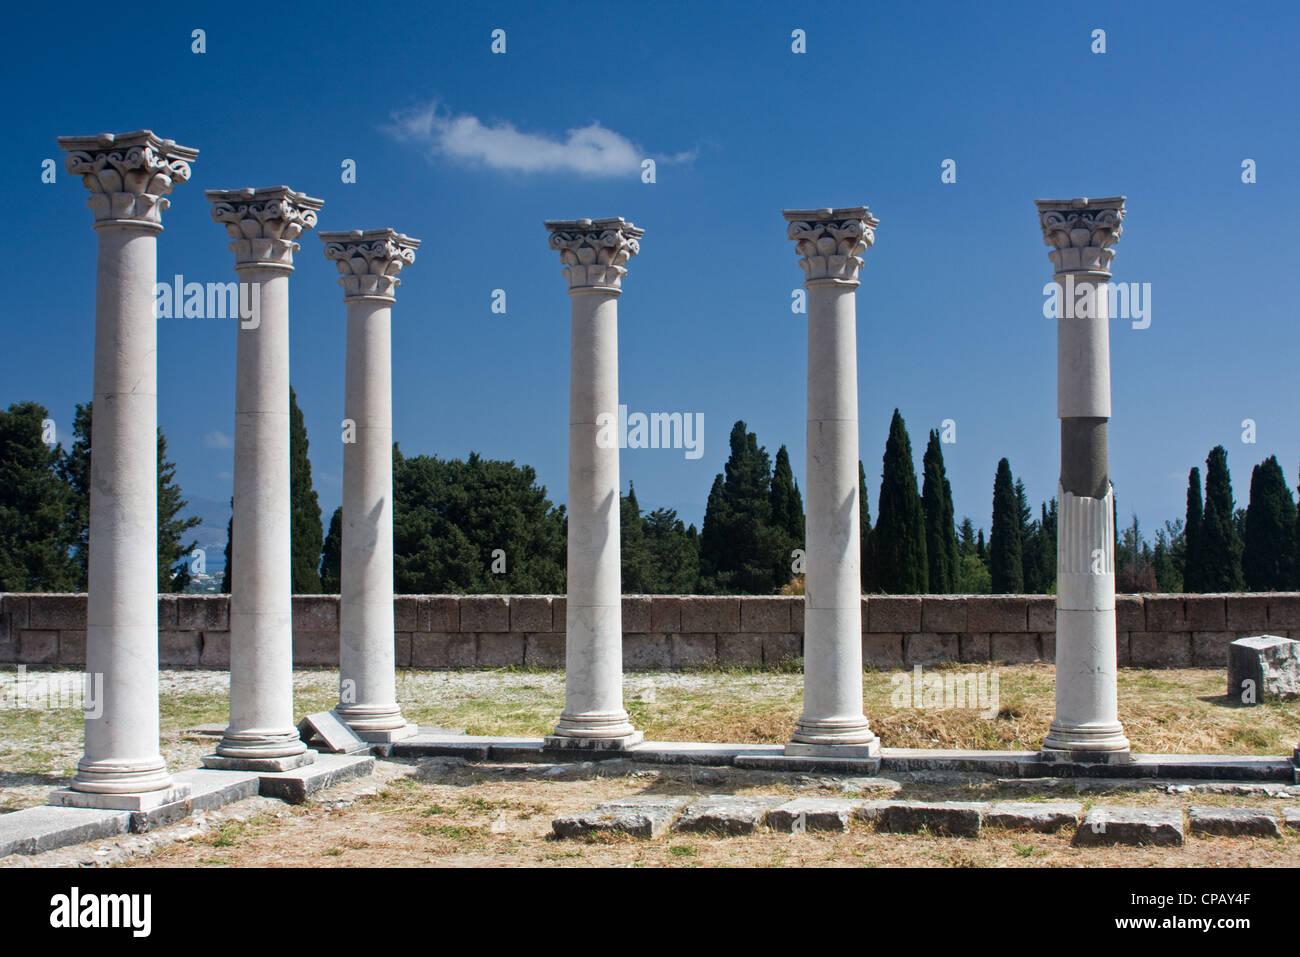 Corinthian columns of the Asklepion on the greek island Kos - Stock Image